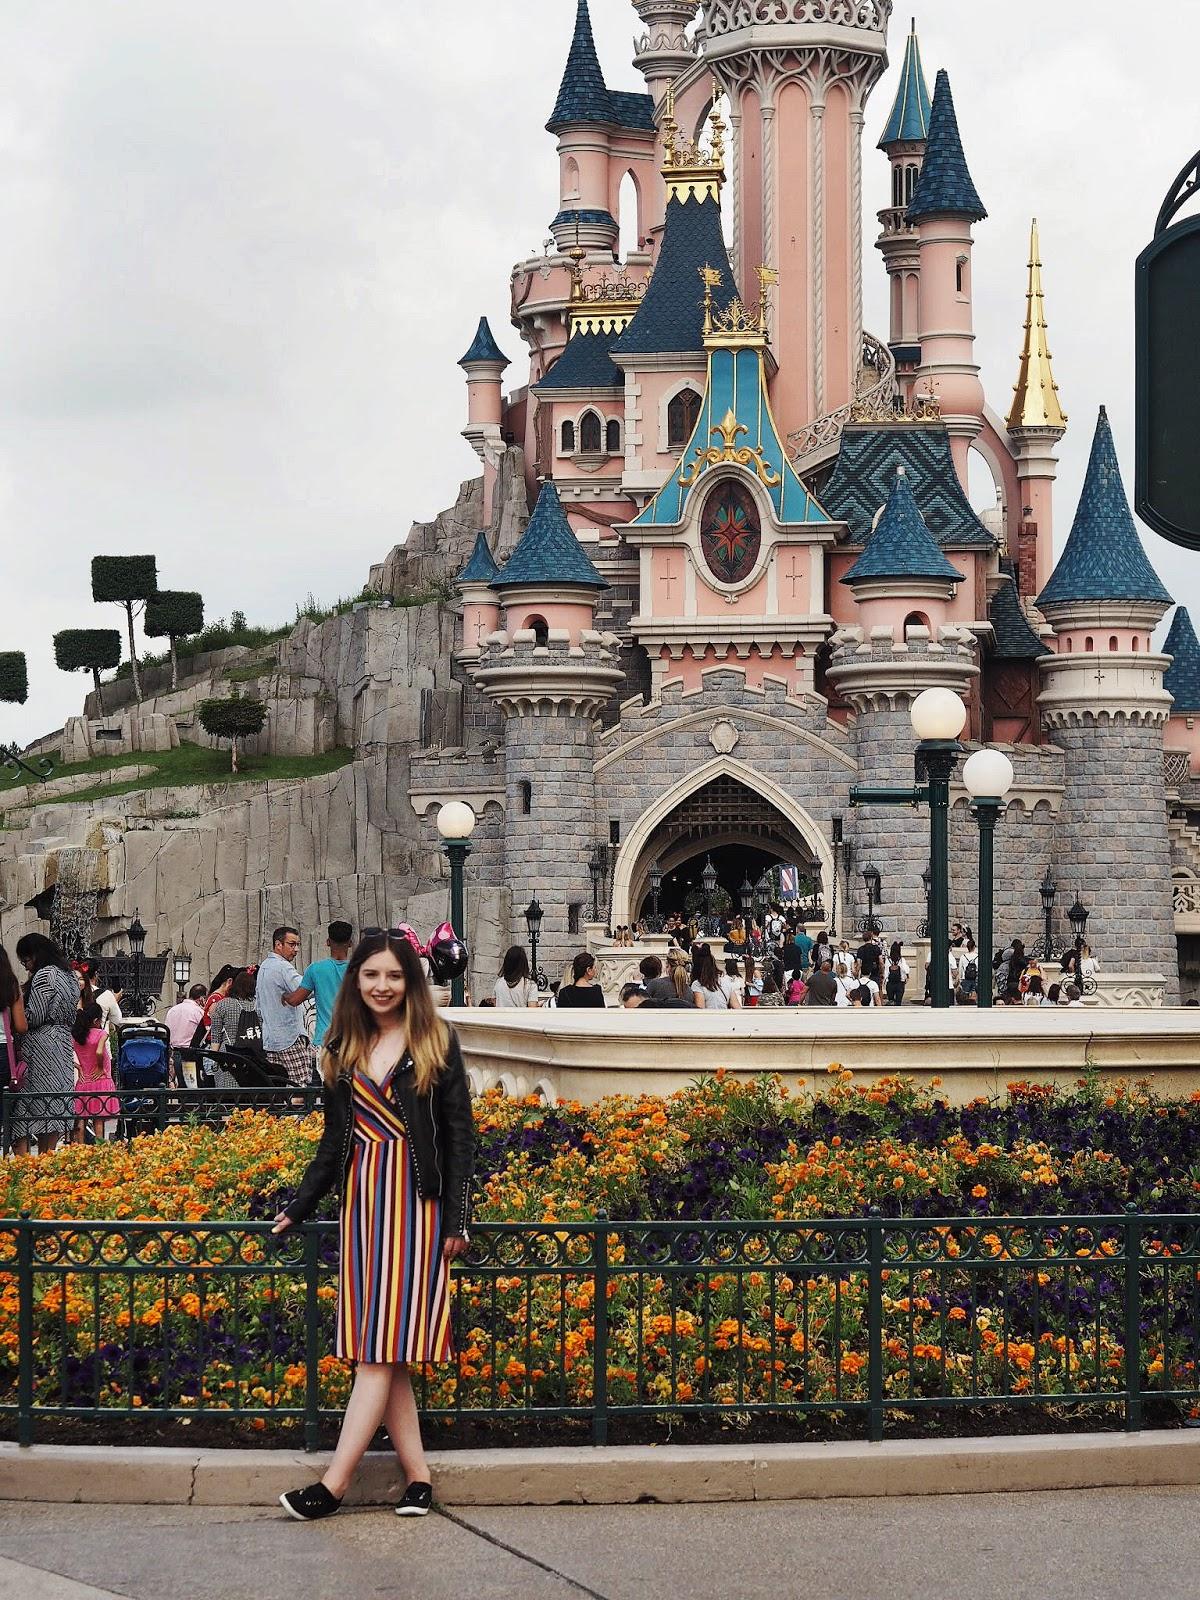 Disneyland Paris | Disneyland Palace | Cinderella